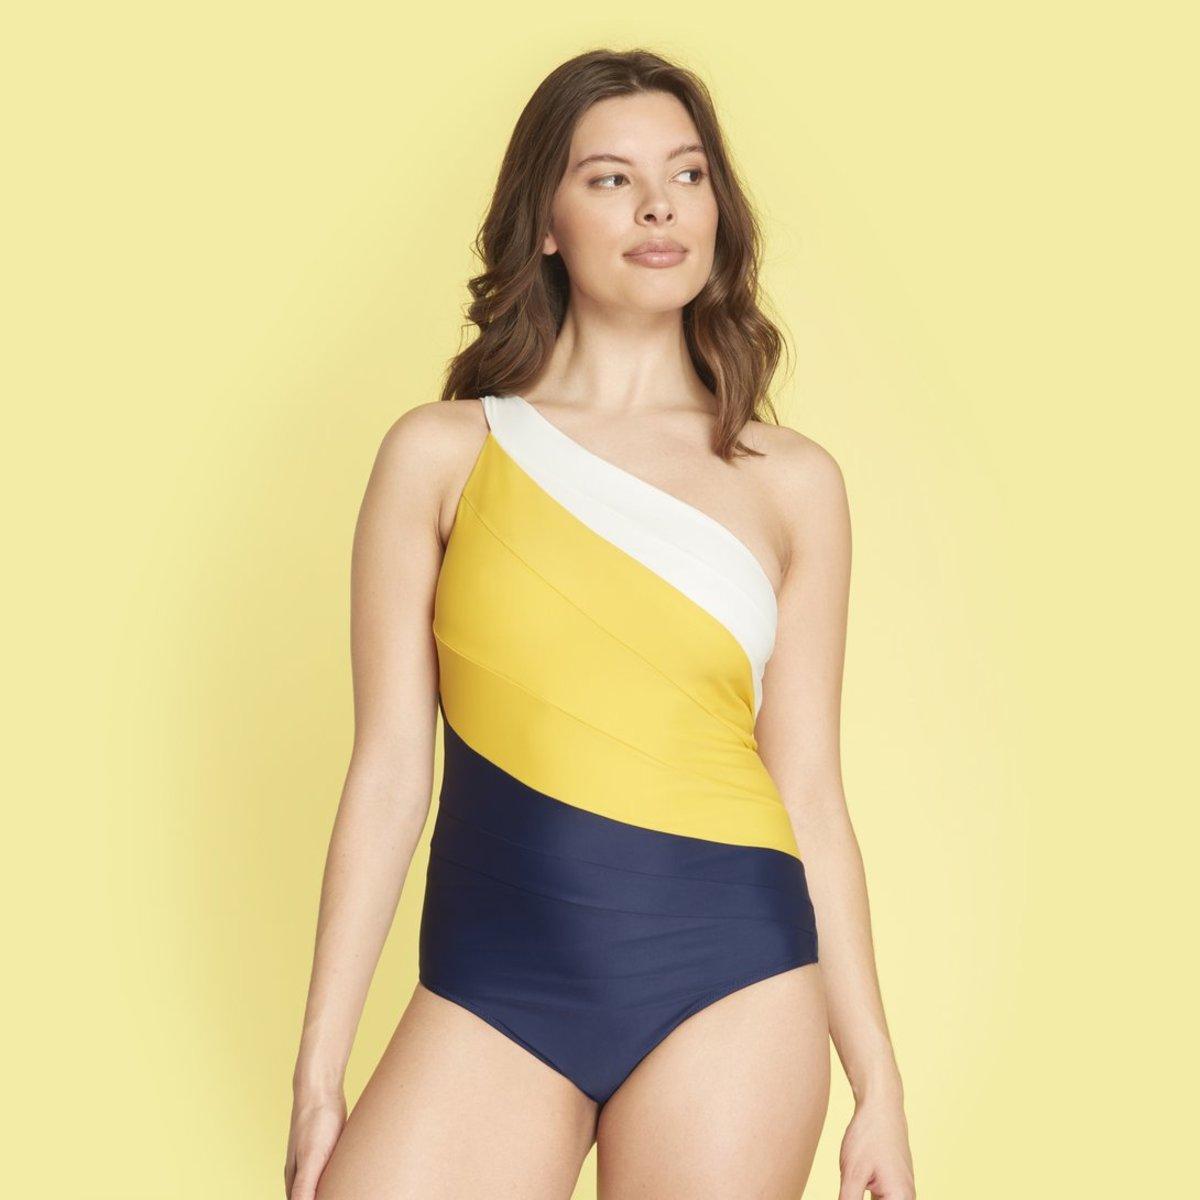 Summersalt Sidestroke swimsuit. Photo: Summersalt